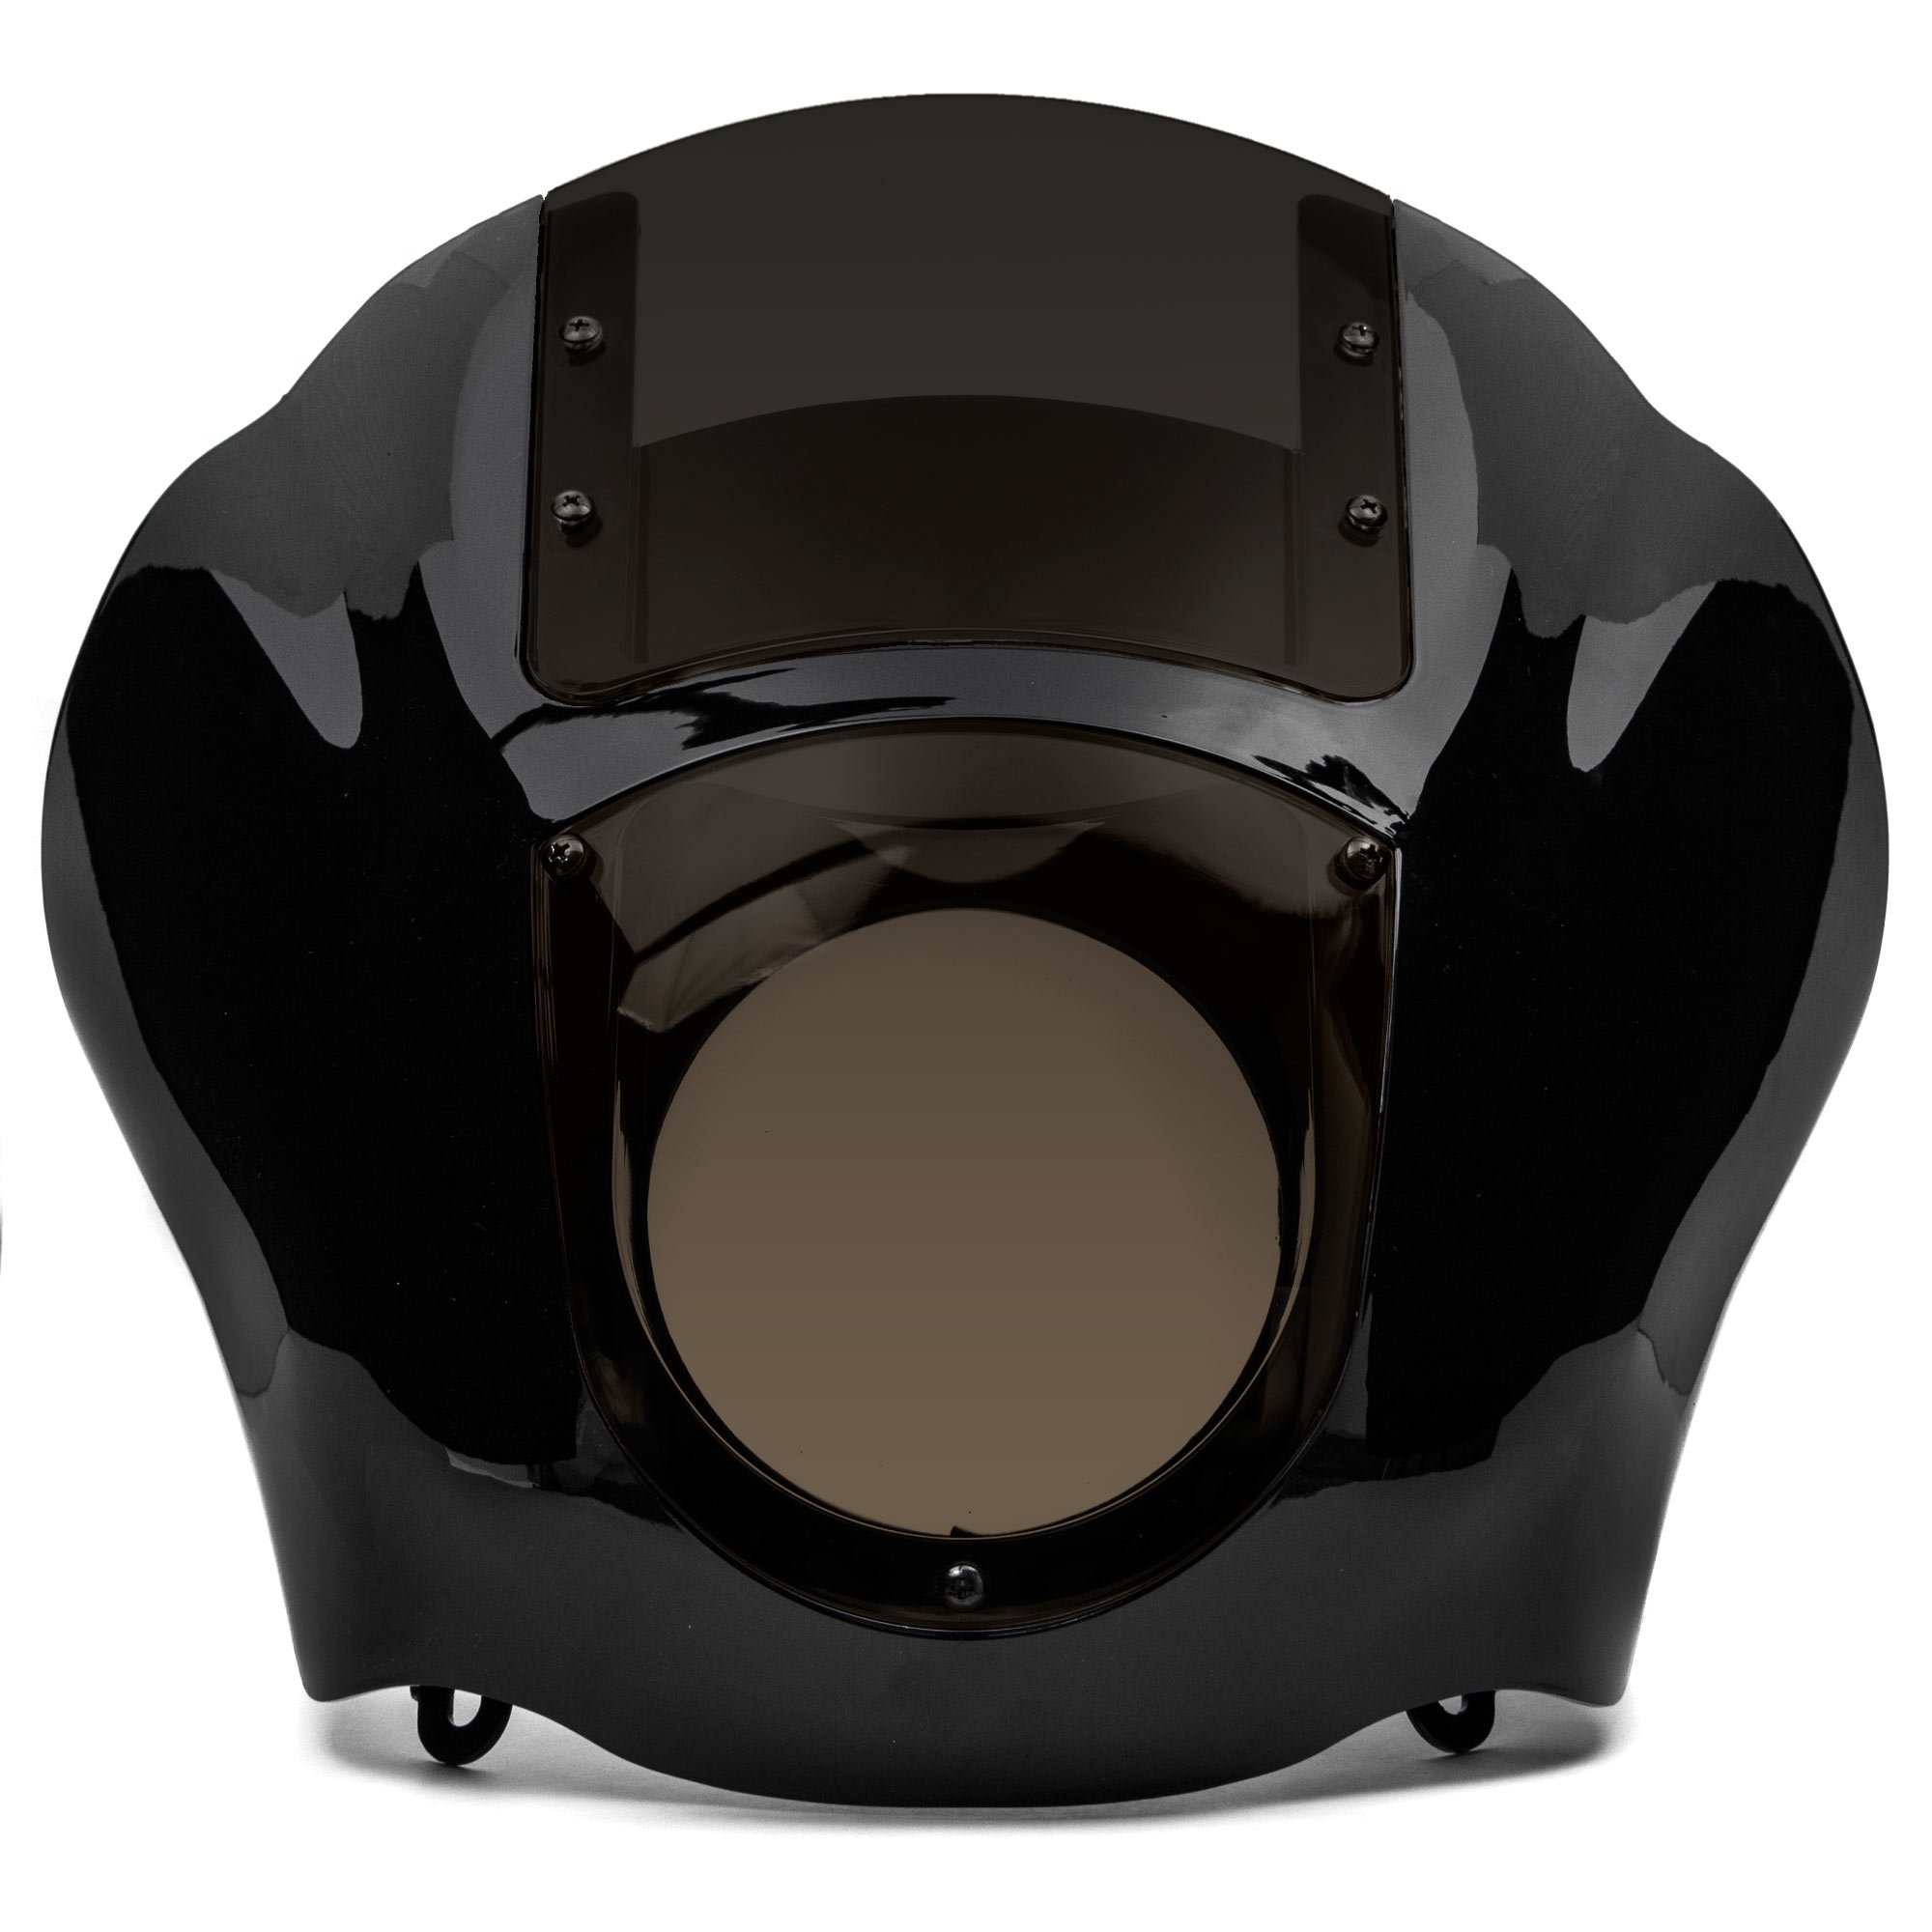 Krator NEW Black & Smoke Quarter Fairing Windshield Kit for Harley Davidson XL FXR Dyna